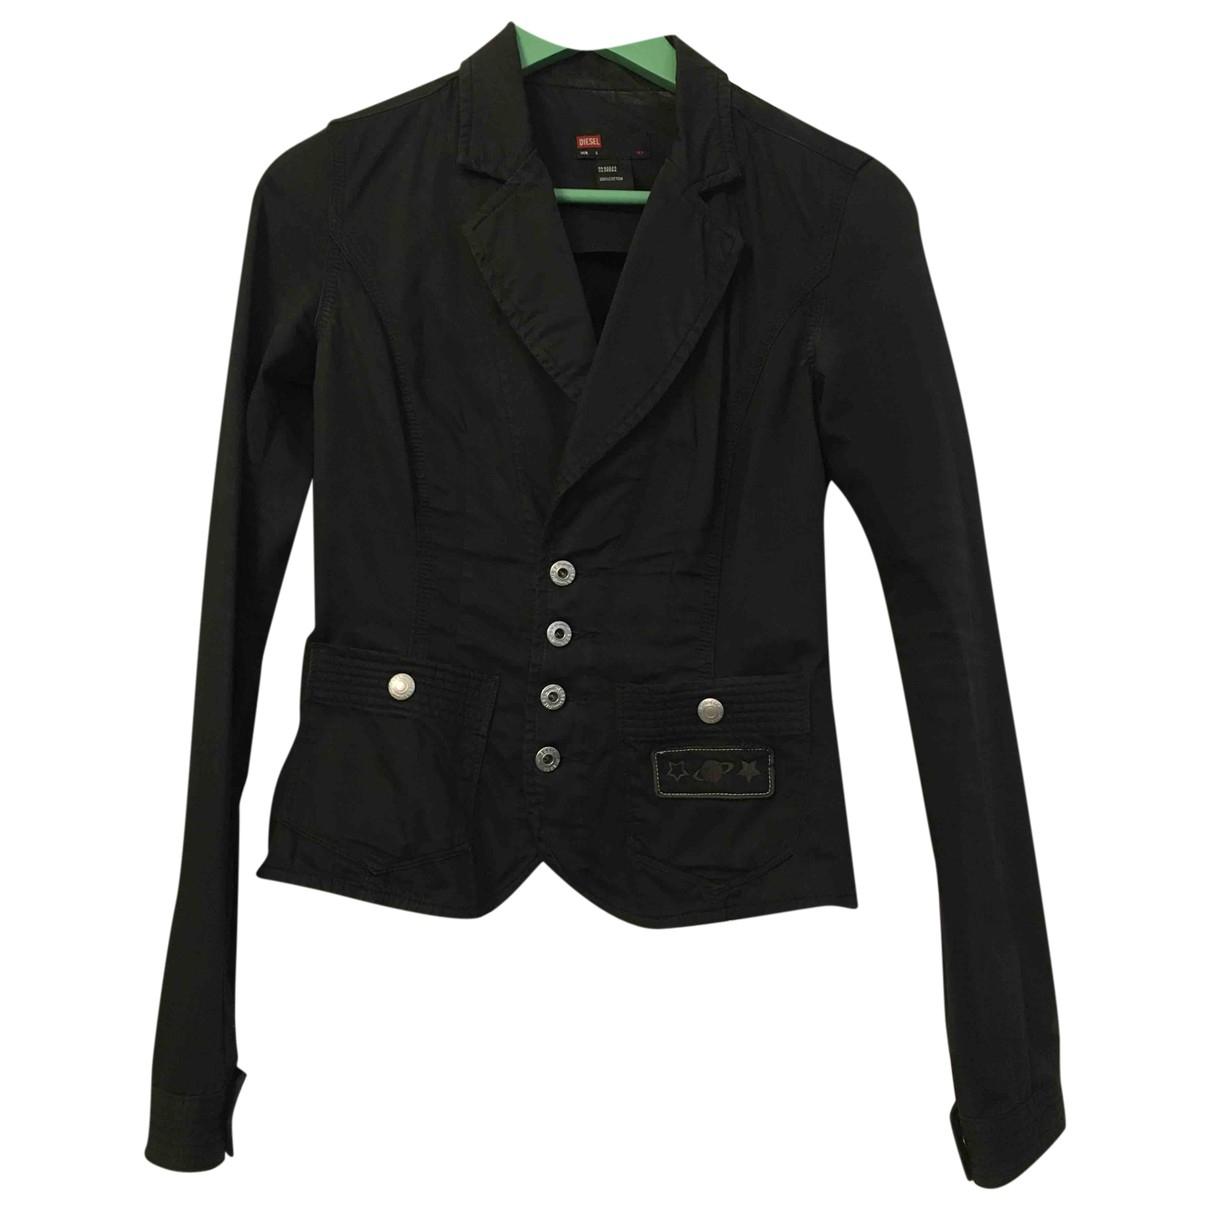 Diesel \N Black Cotton jacket for Women S International